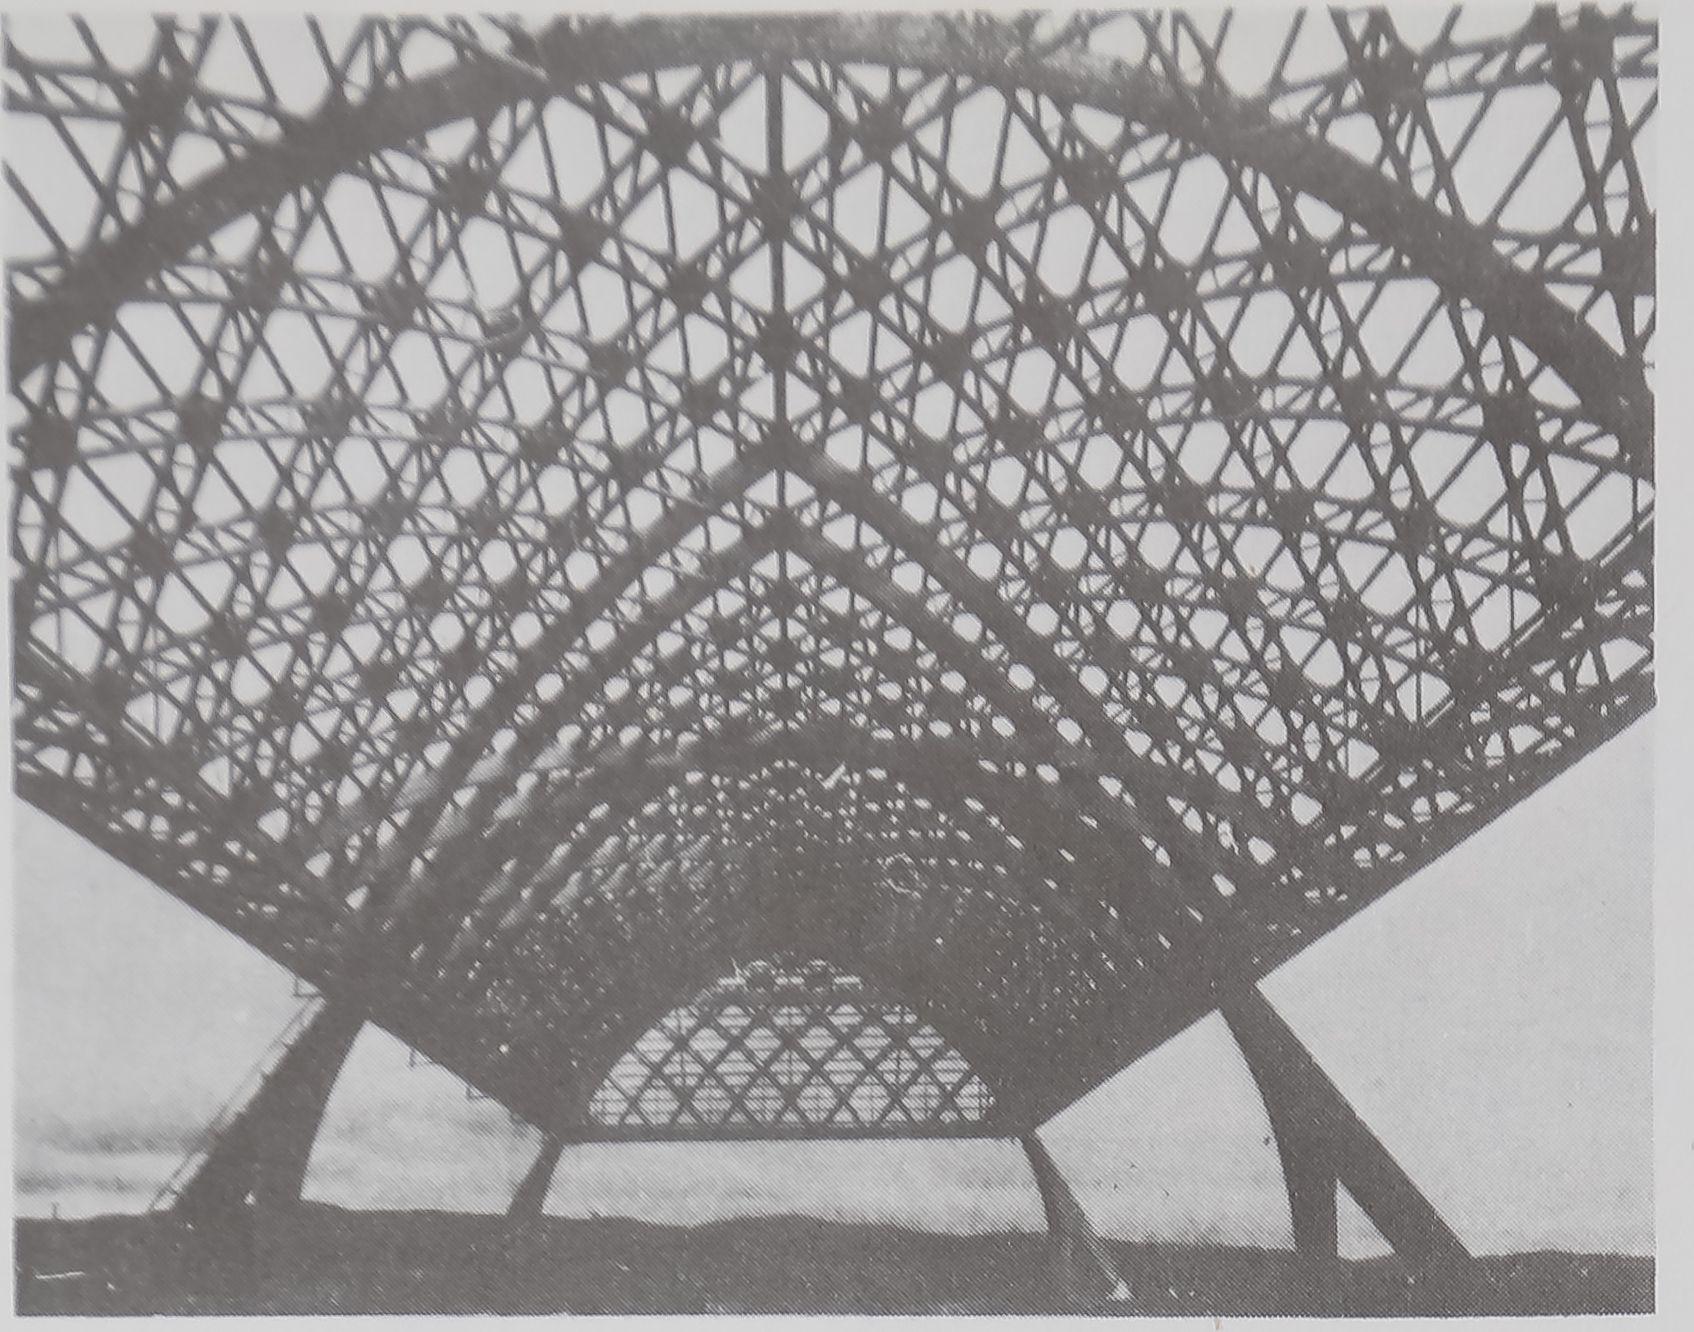 1976-SpiderWebsDesign-11